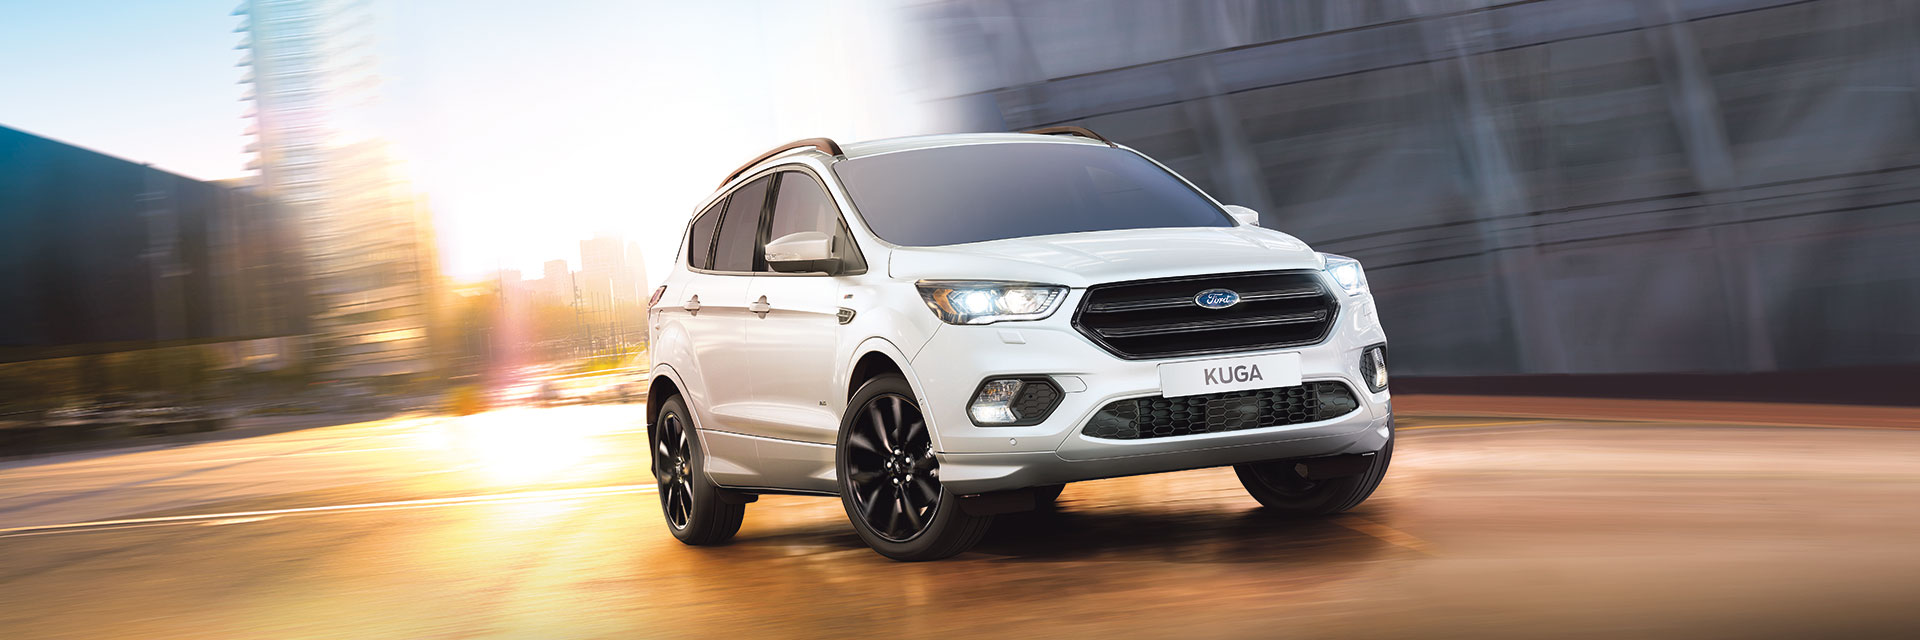 Uusi Ford Kuga ensiesittelyssä